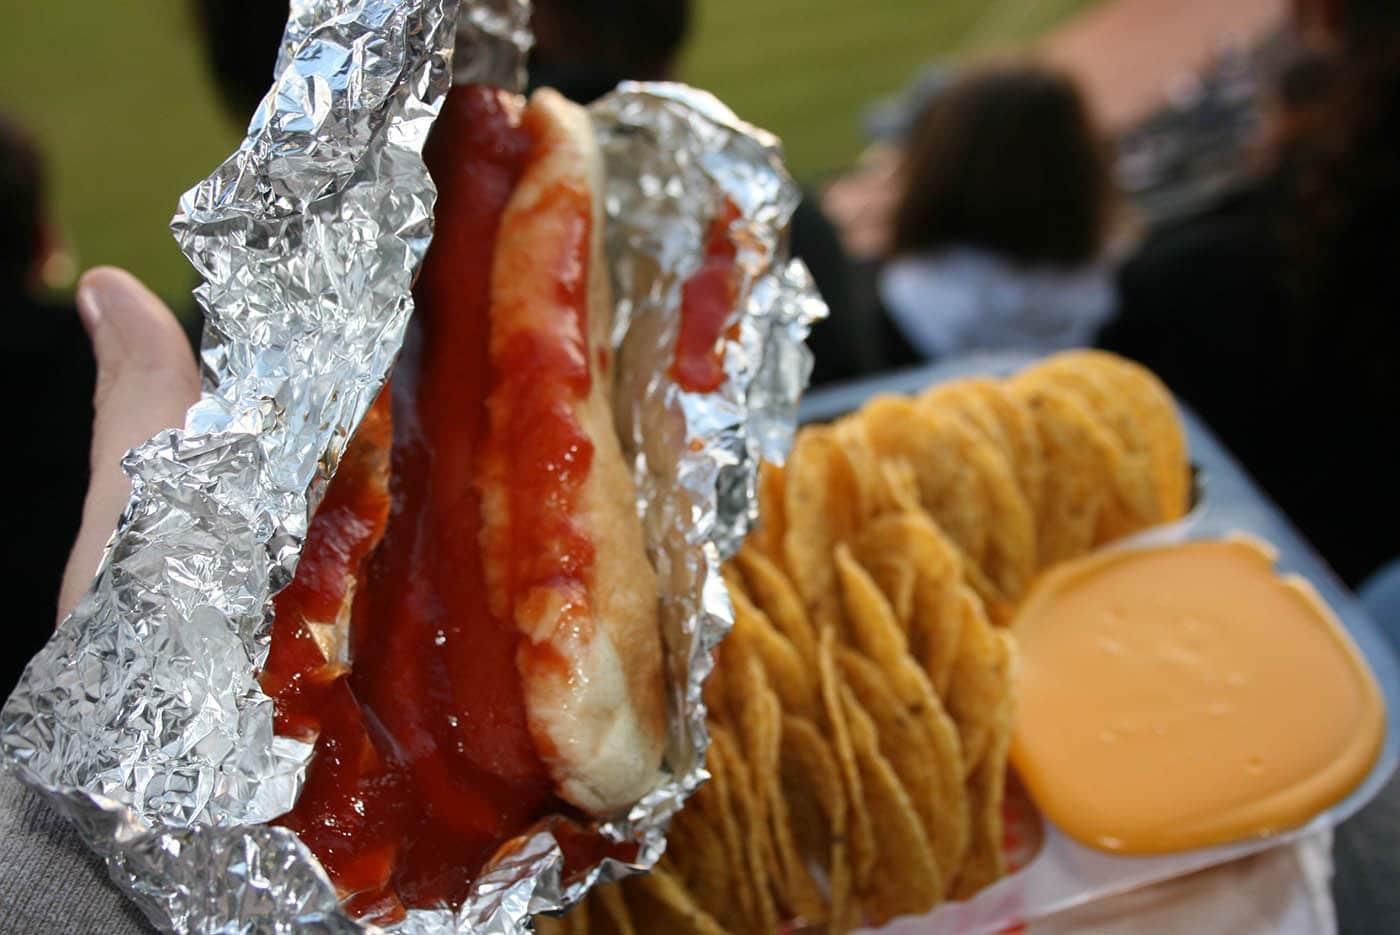 Ballpark hot dog smothered in ketchup at a White Sox game.